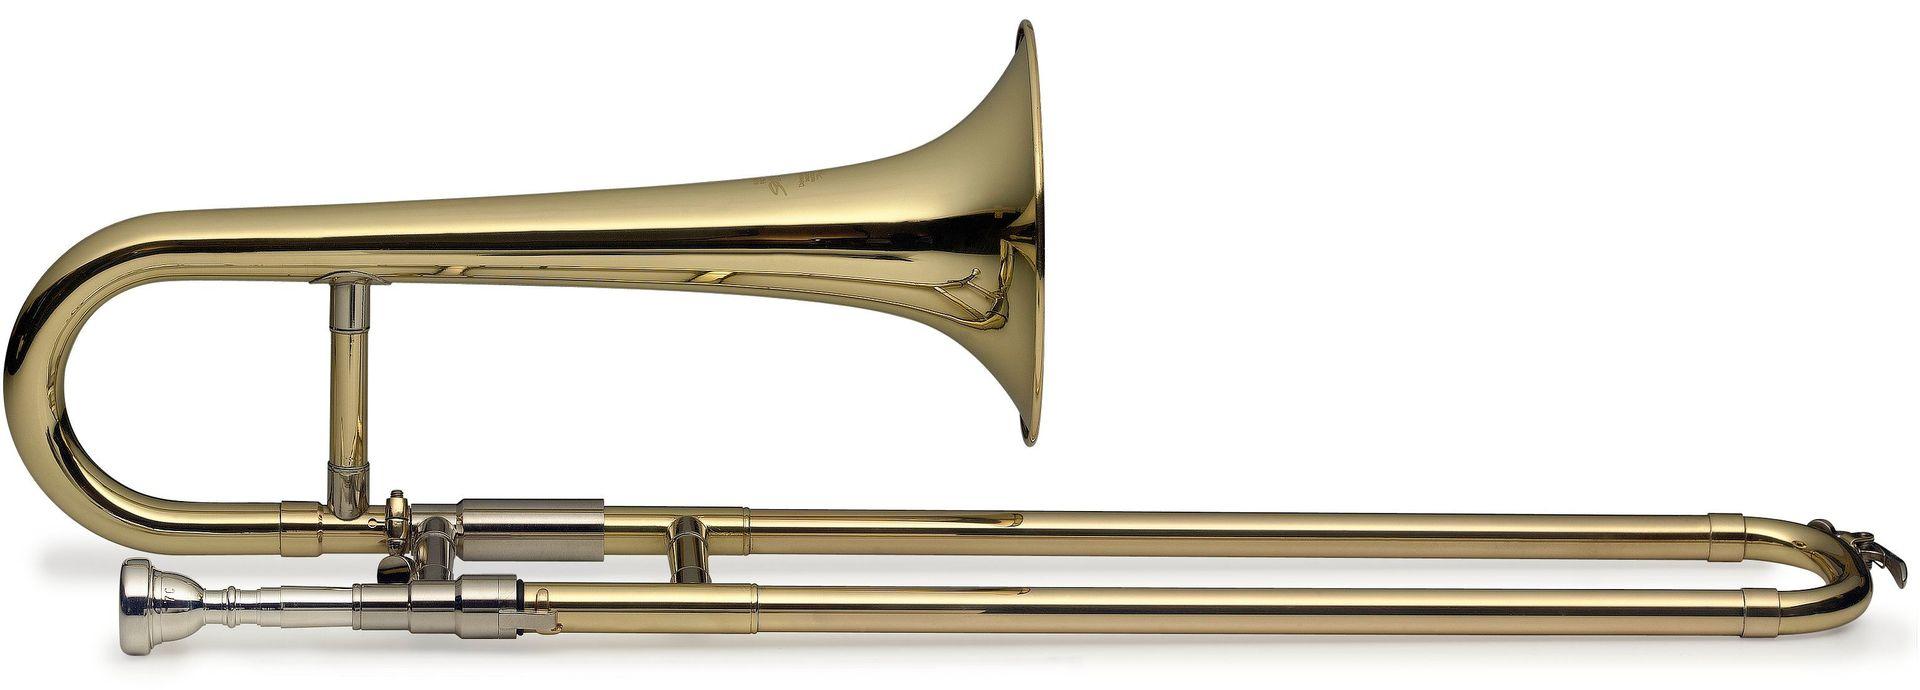 SWING TR-SL-201 B-Zugtrompete / Sopranposaune lackiert, Bohrung 11,50mm